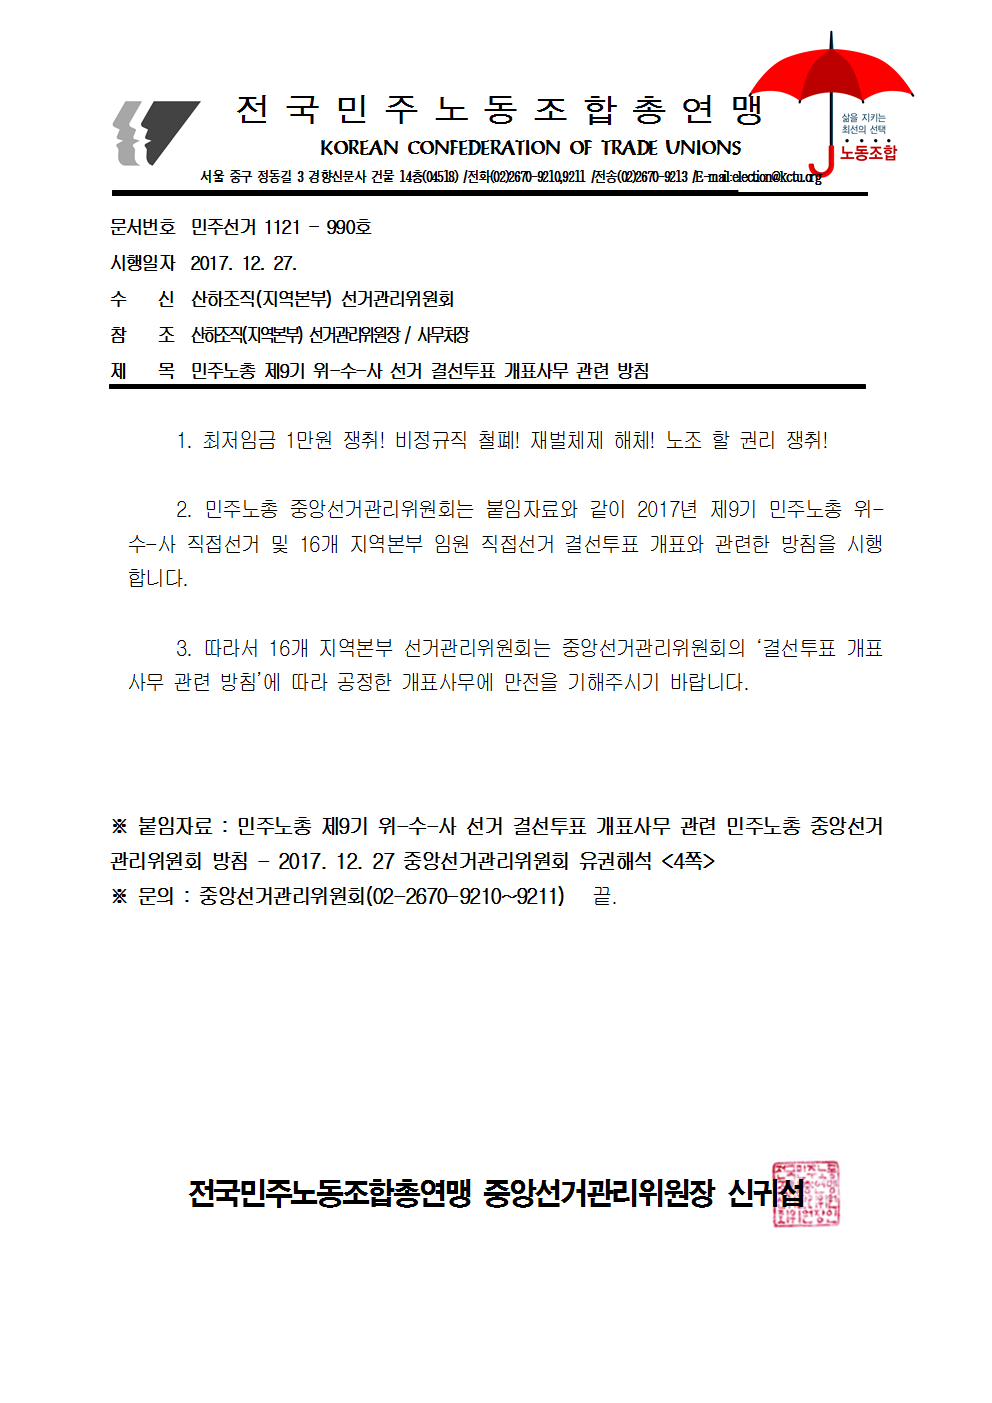 17kctu990_민주노총 제9기 위-수-사 선거 결선투표 개표사무 관련 방침001.png